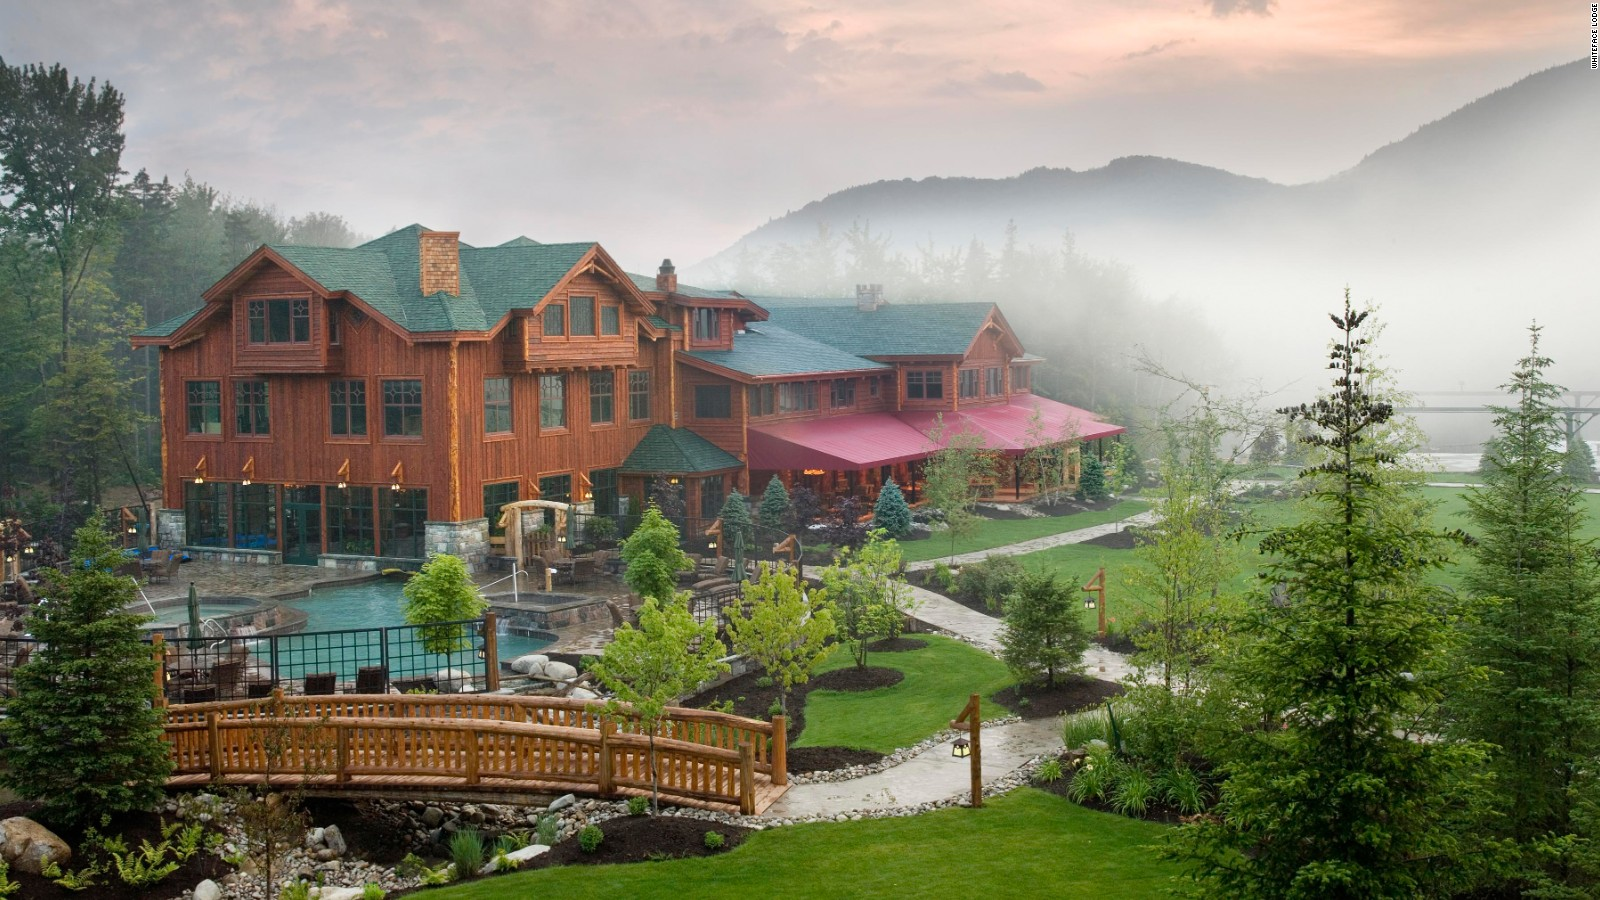 Adirondacks historic lodges rough it like millionaires cnn travel